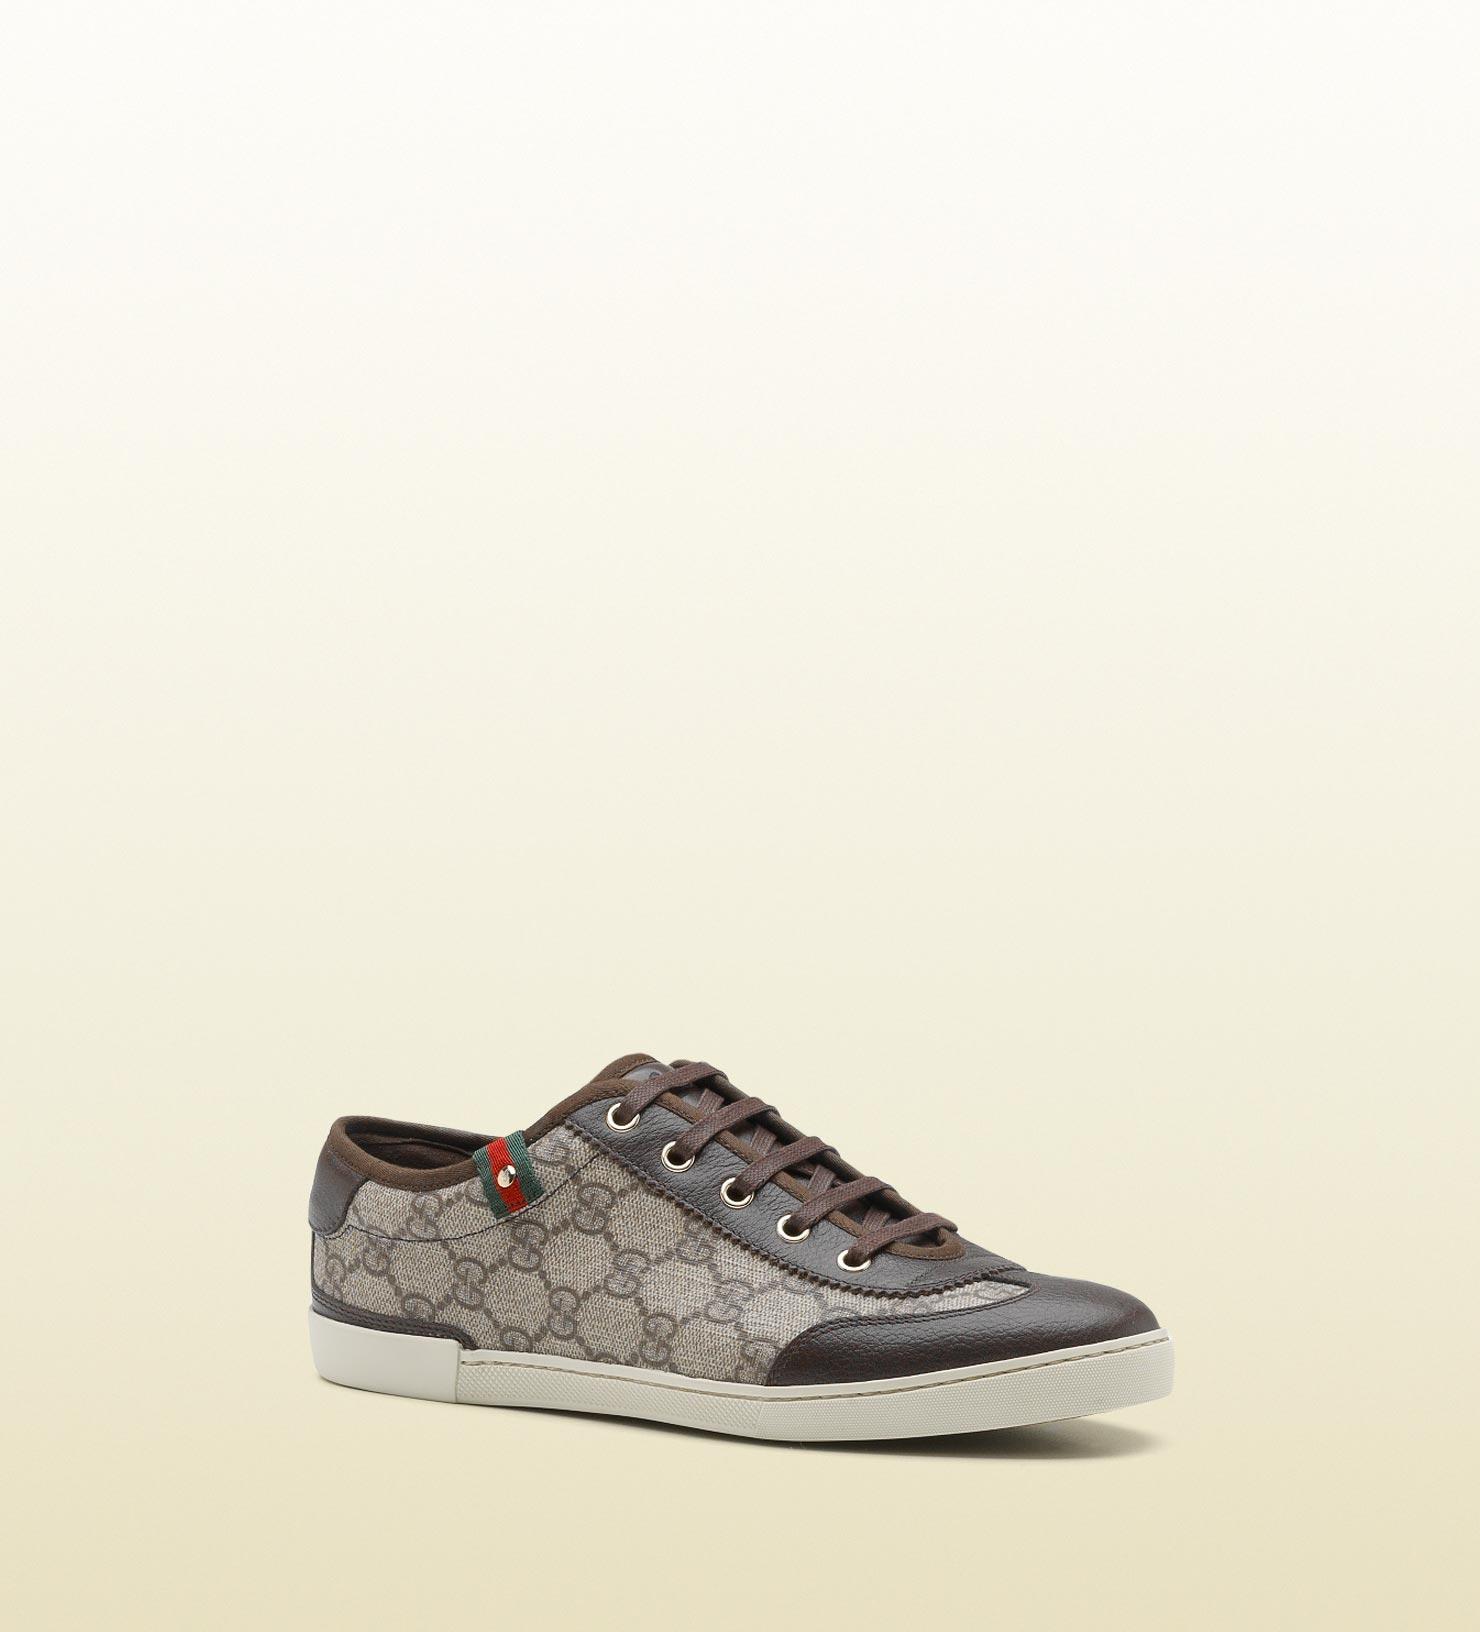 5b695136c Gucci Barcelona Gg Supreme Canvas Sneaker in Natural for Men - Lyst